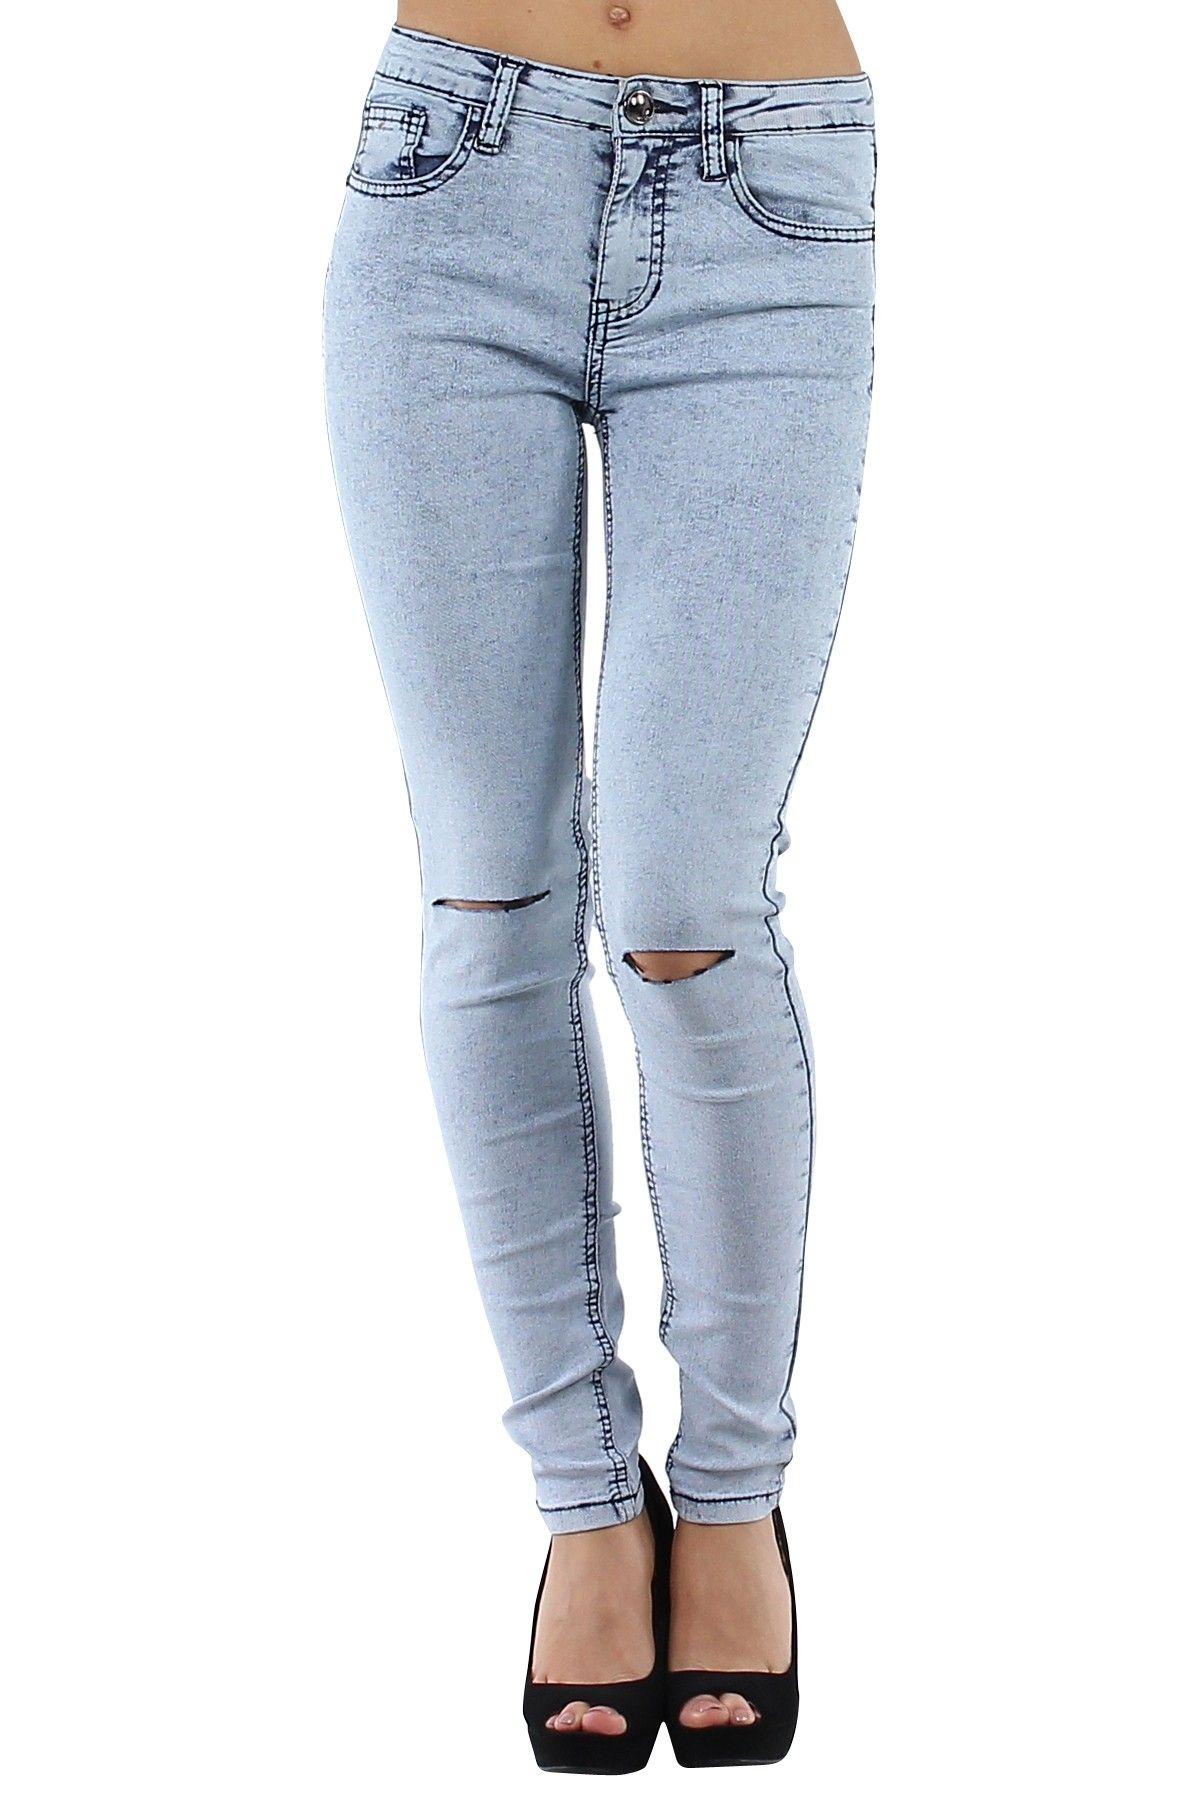 Moda Vaqueros Pantalones Legz Yyfb4o Vaquera SqPwnxd8